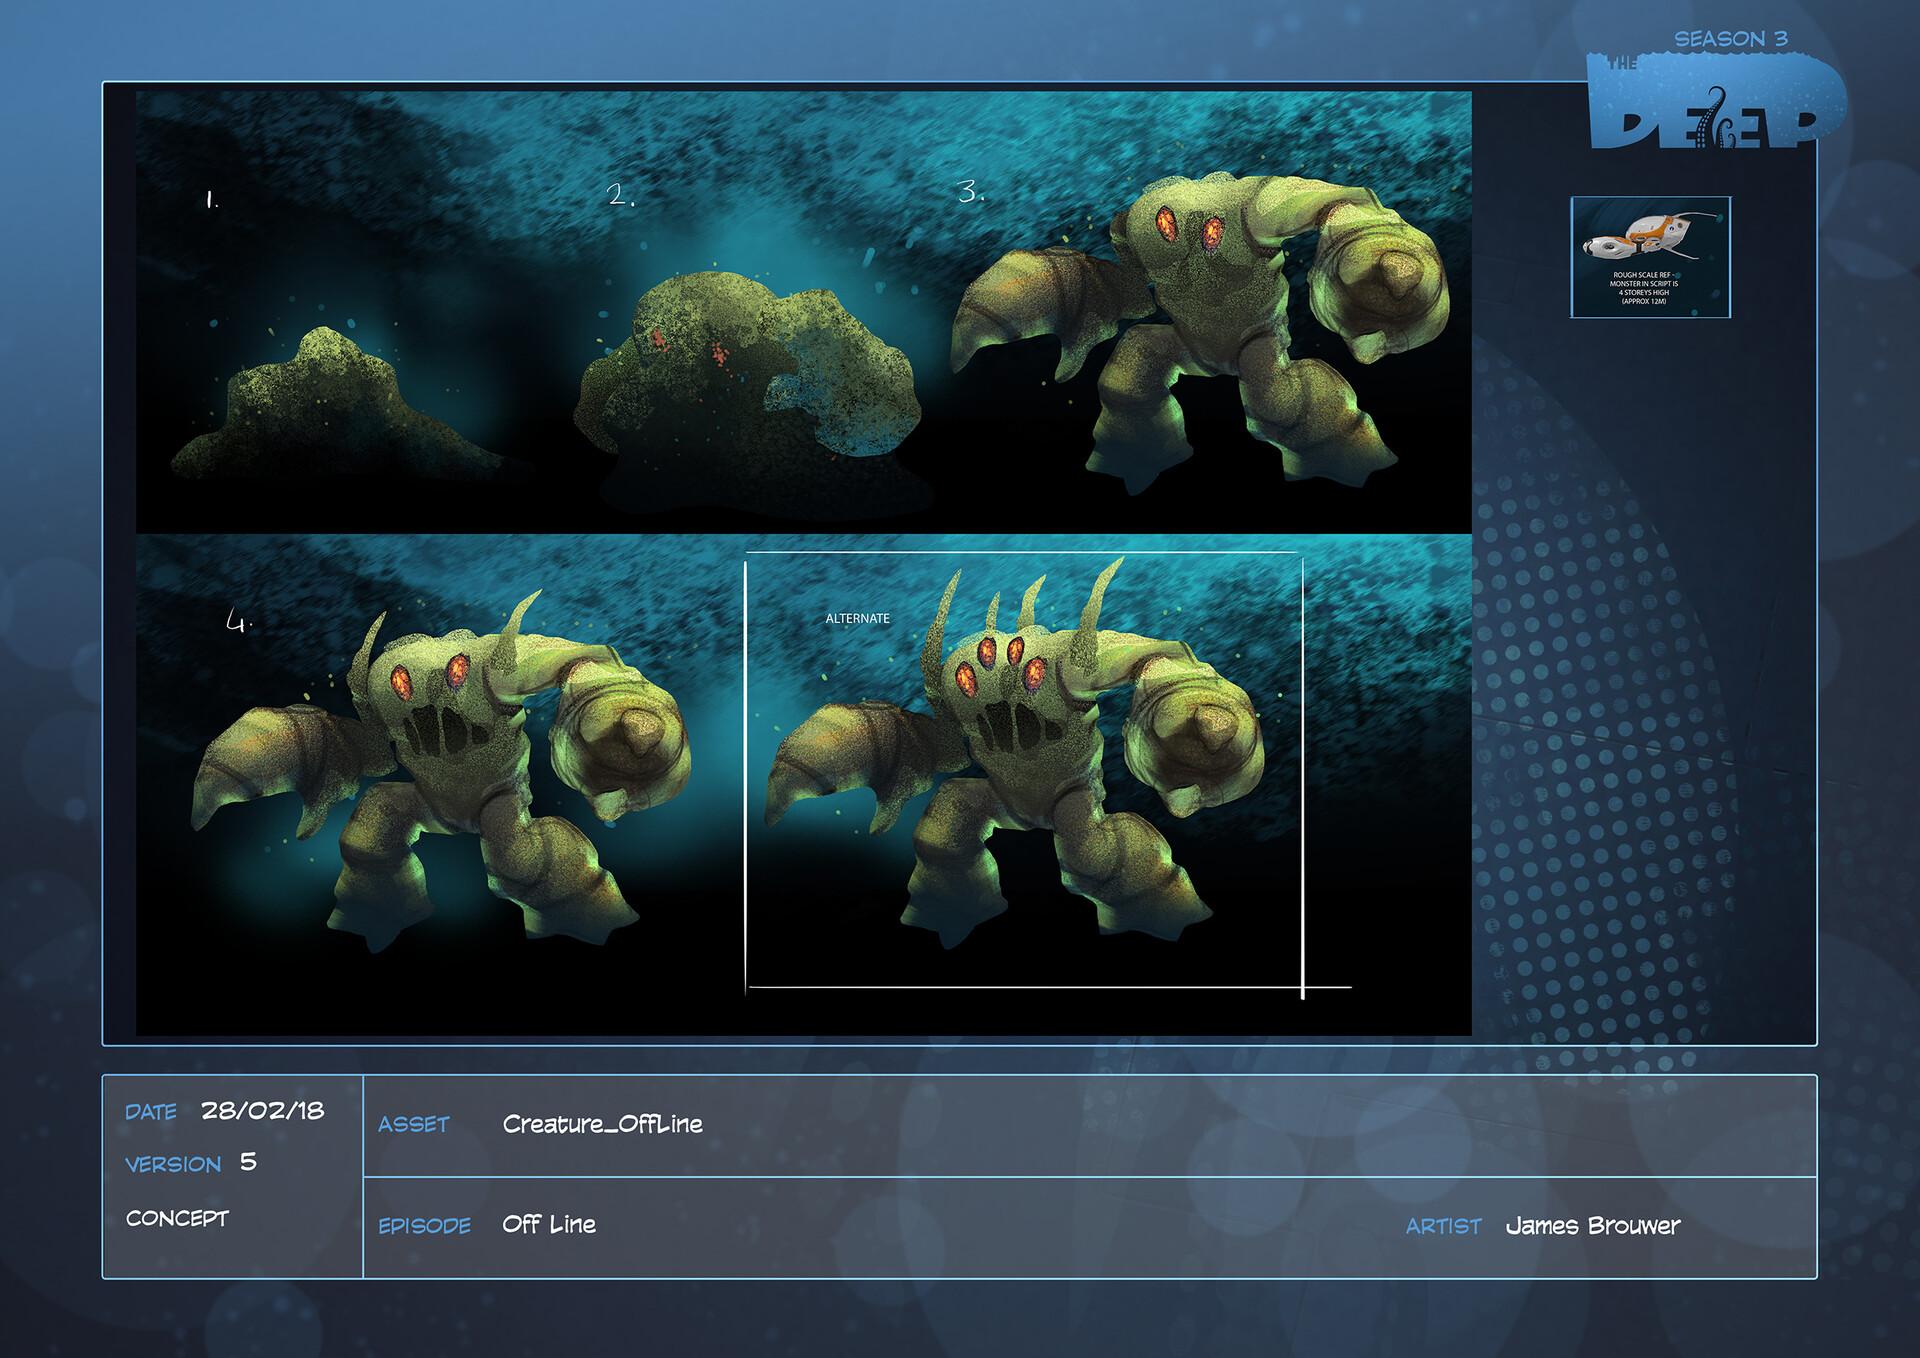 James brouwer creature offline design v005